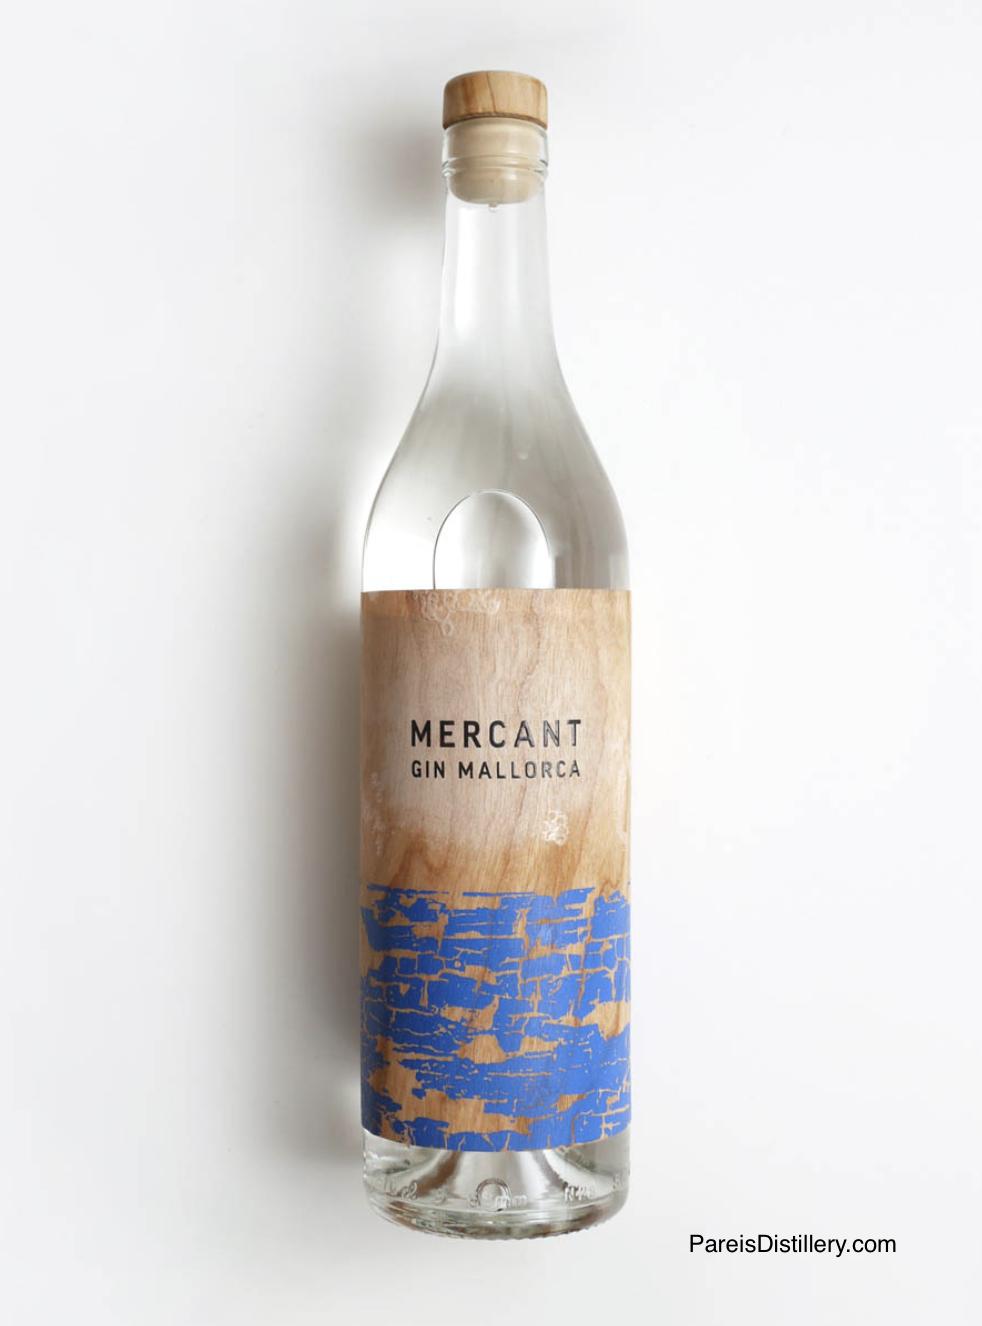 Mercant Gin Mallorca